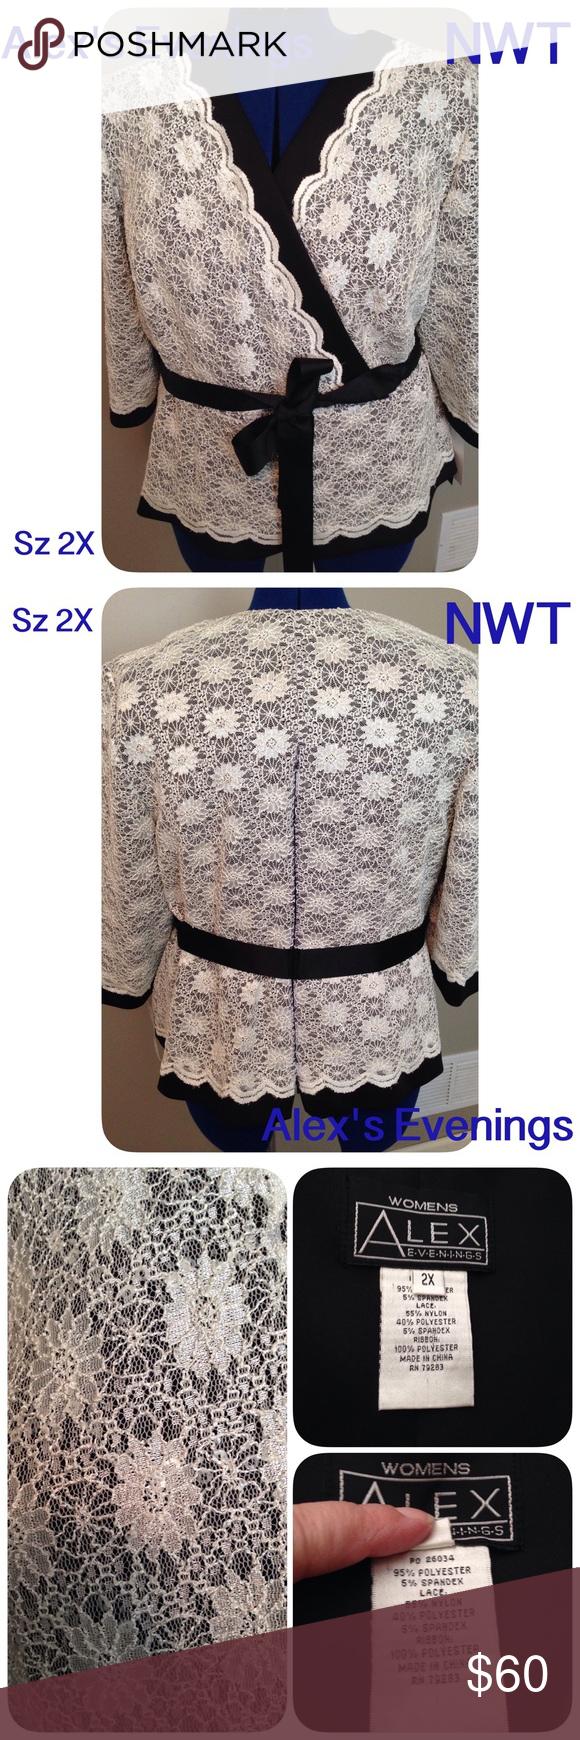 Alex Evenings Dressy Tops